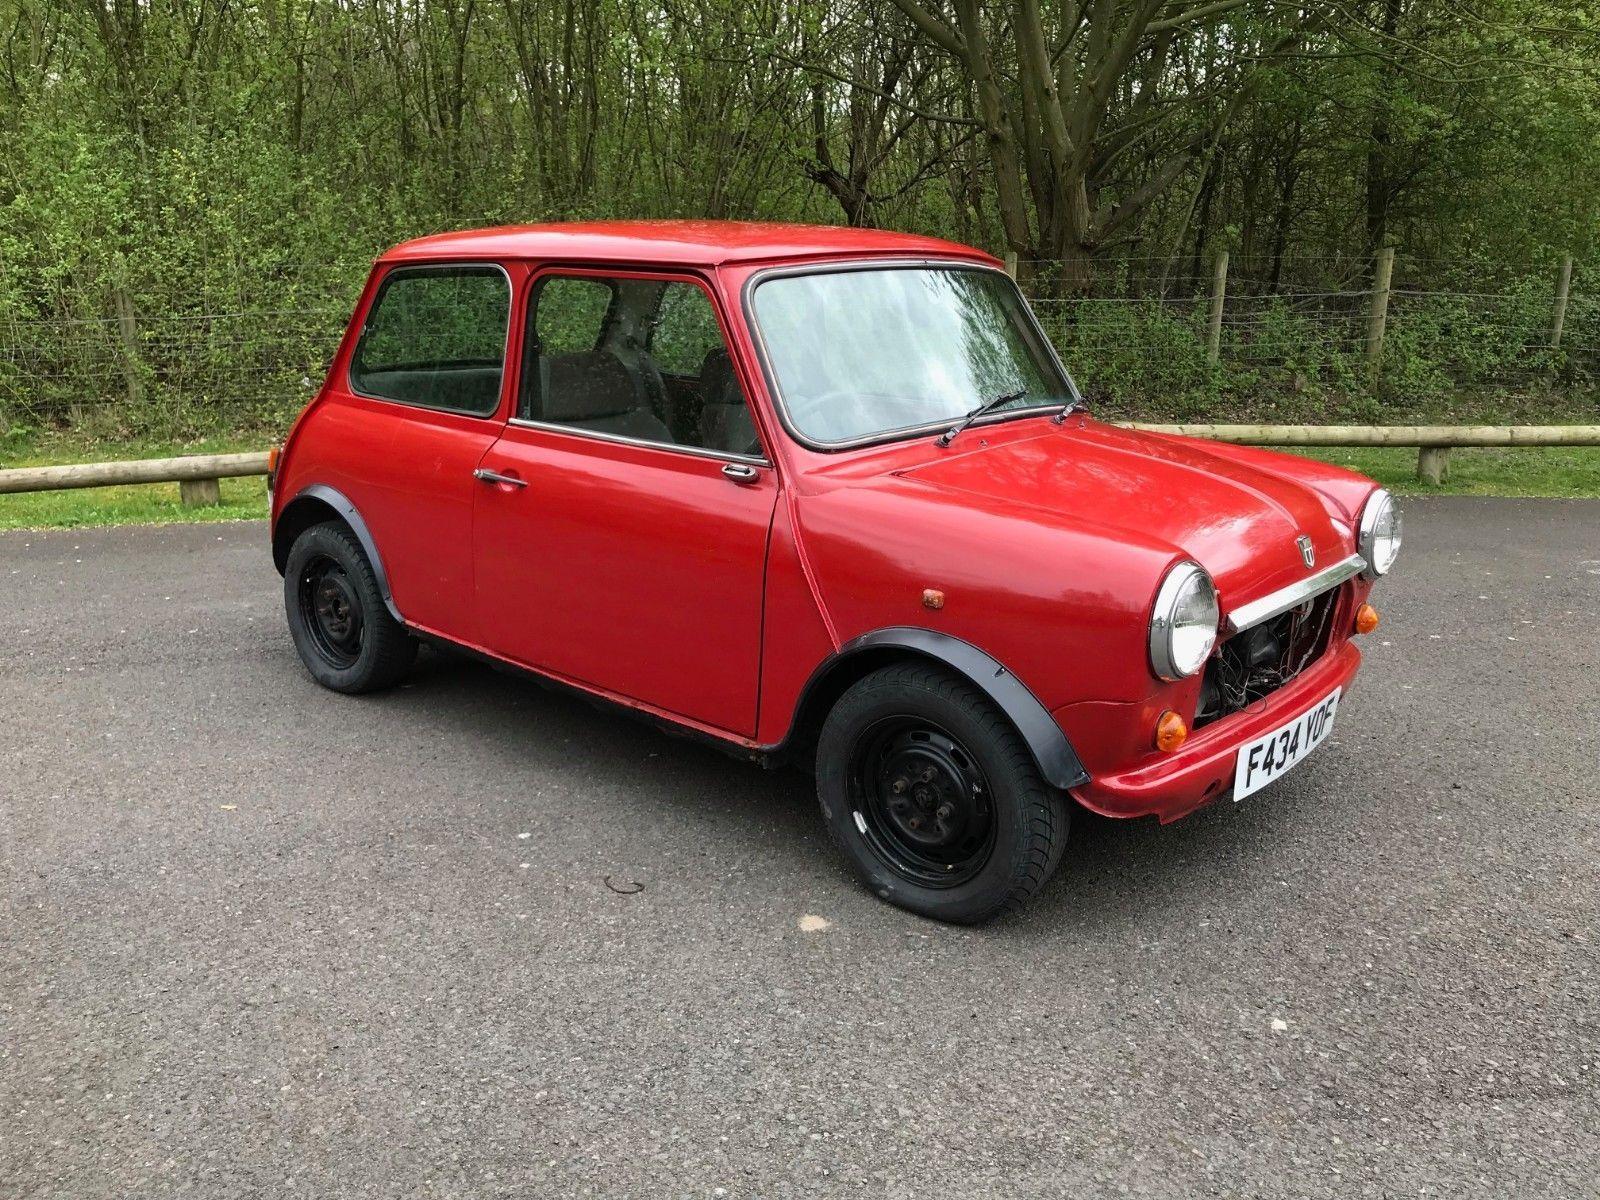 eBay: 1988 Austin Mini Mayfair Red Small Project Runs Drives